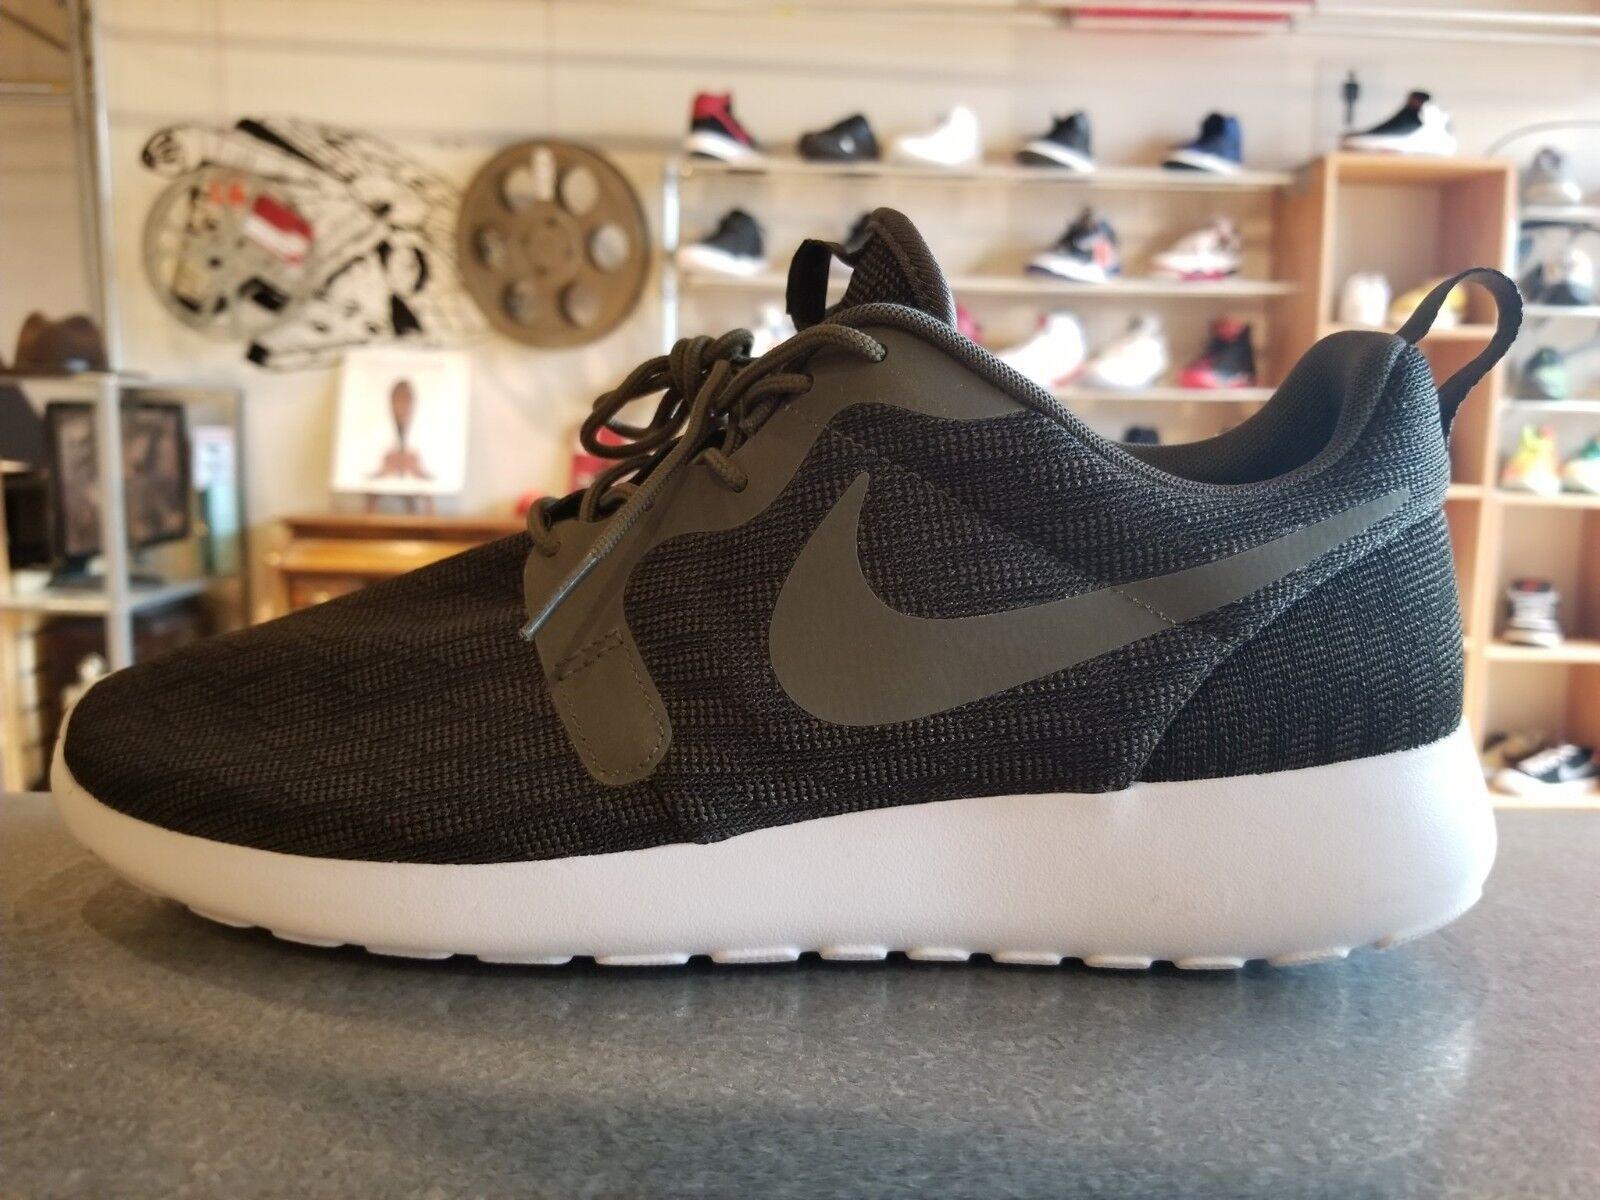 wholesale dealer c22f7 61502 Nike Roshe One Knit Knit Knit Jacquard 777429-300 (NO LID) 0c711b